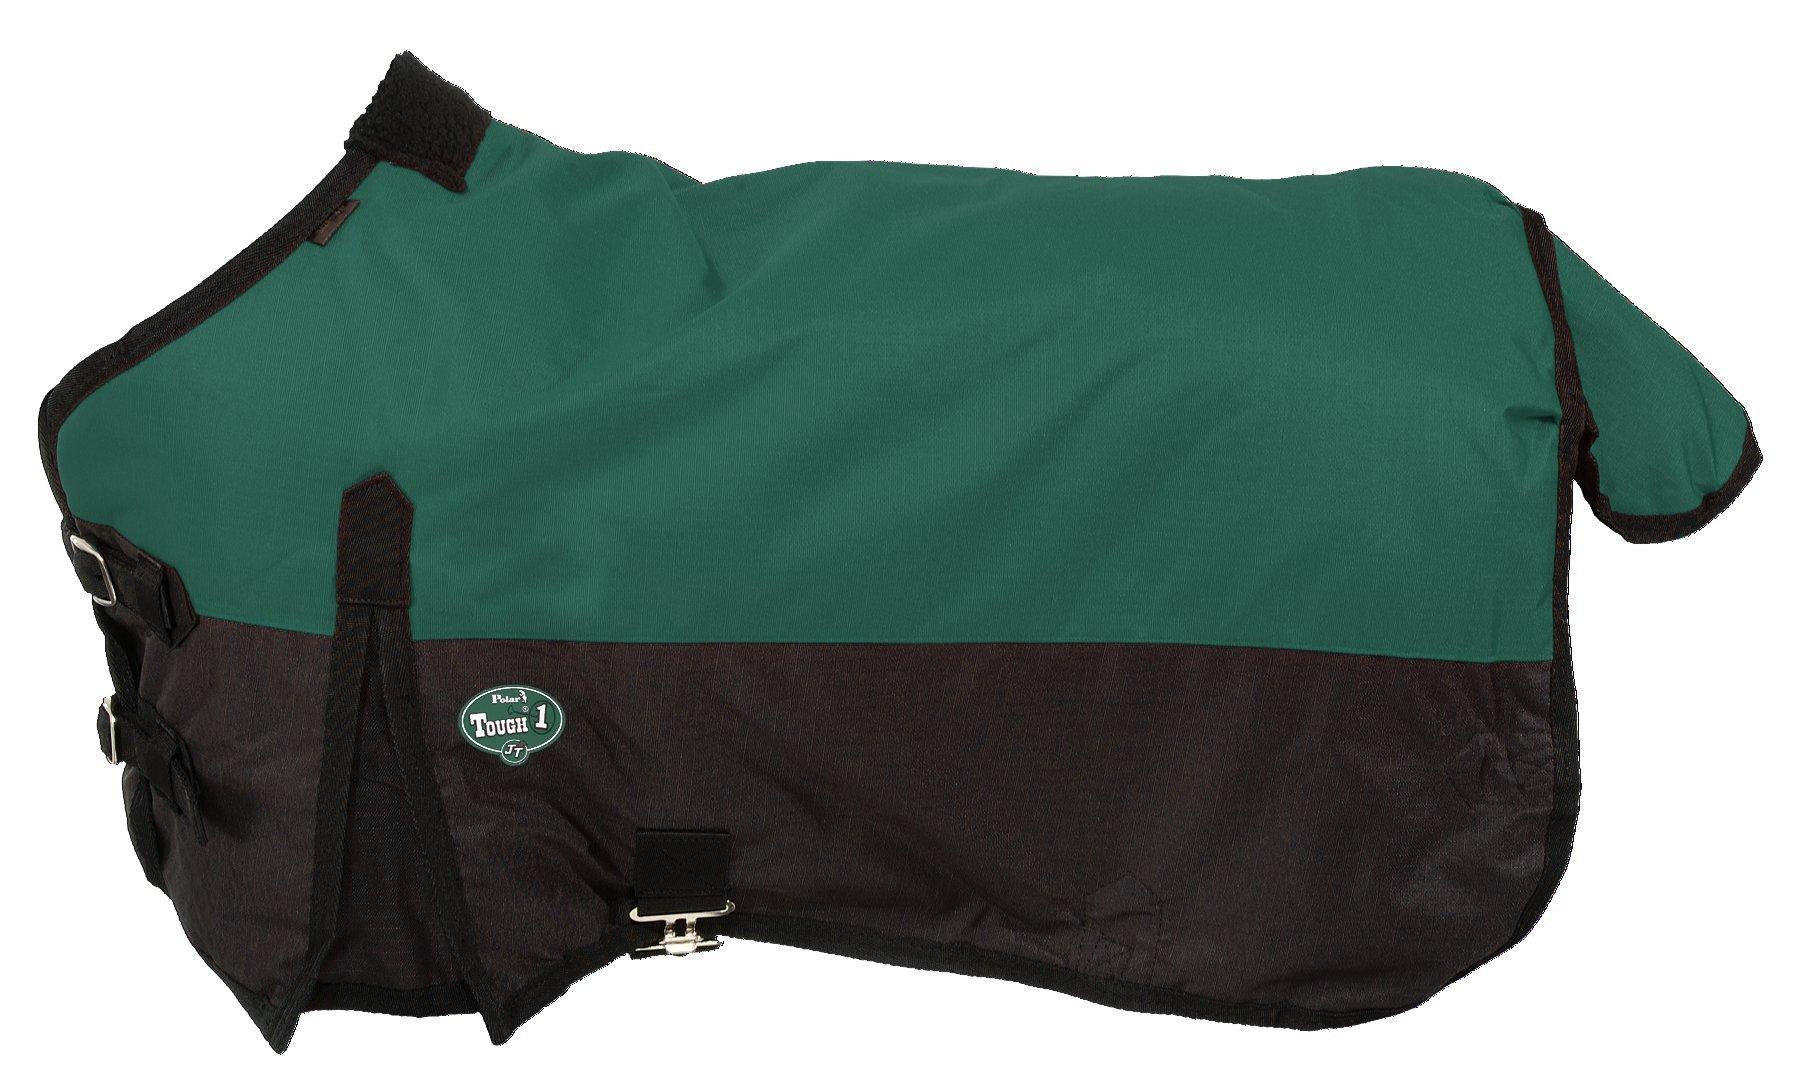 Tough 1 600D Waterproof Poly Miniature Turnout Blanket, Hunter Green, 50''